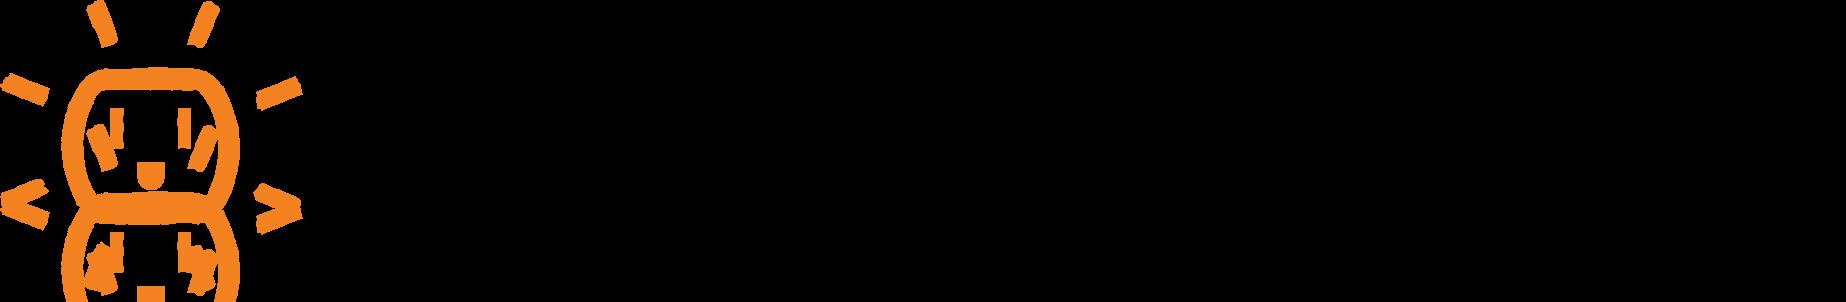 Morgan Solar company logo